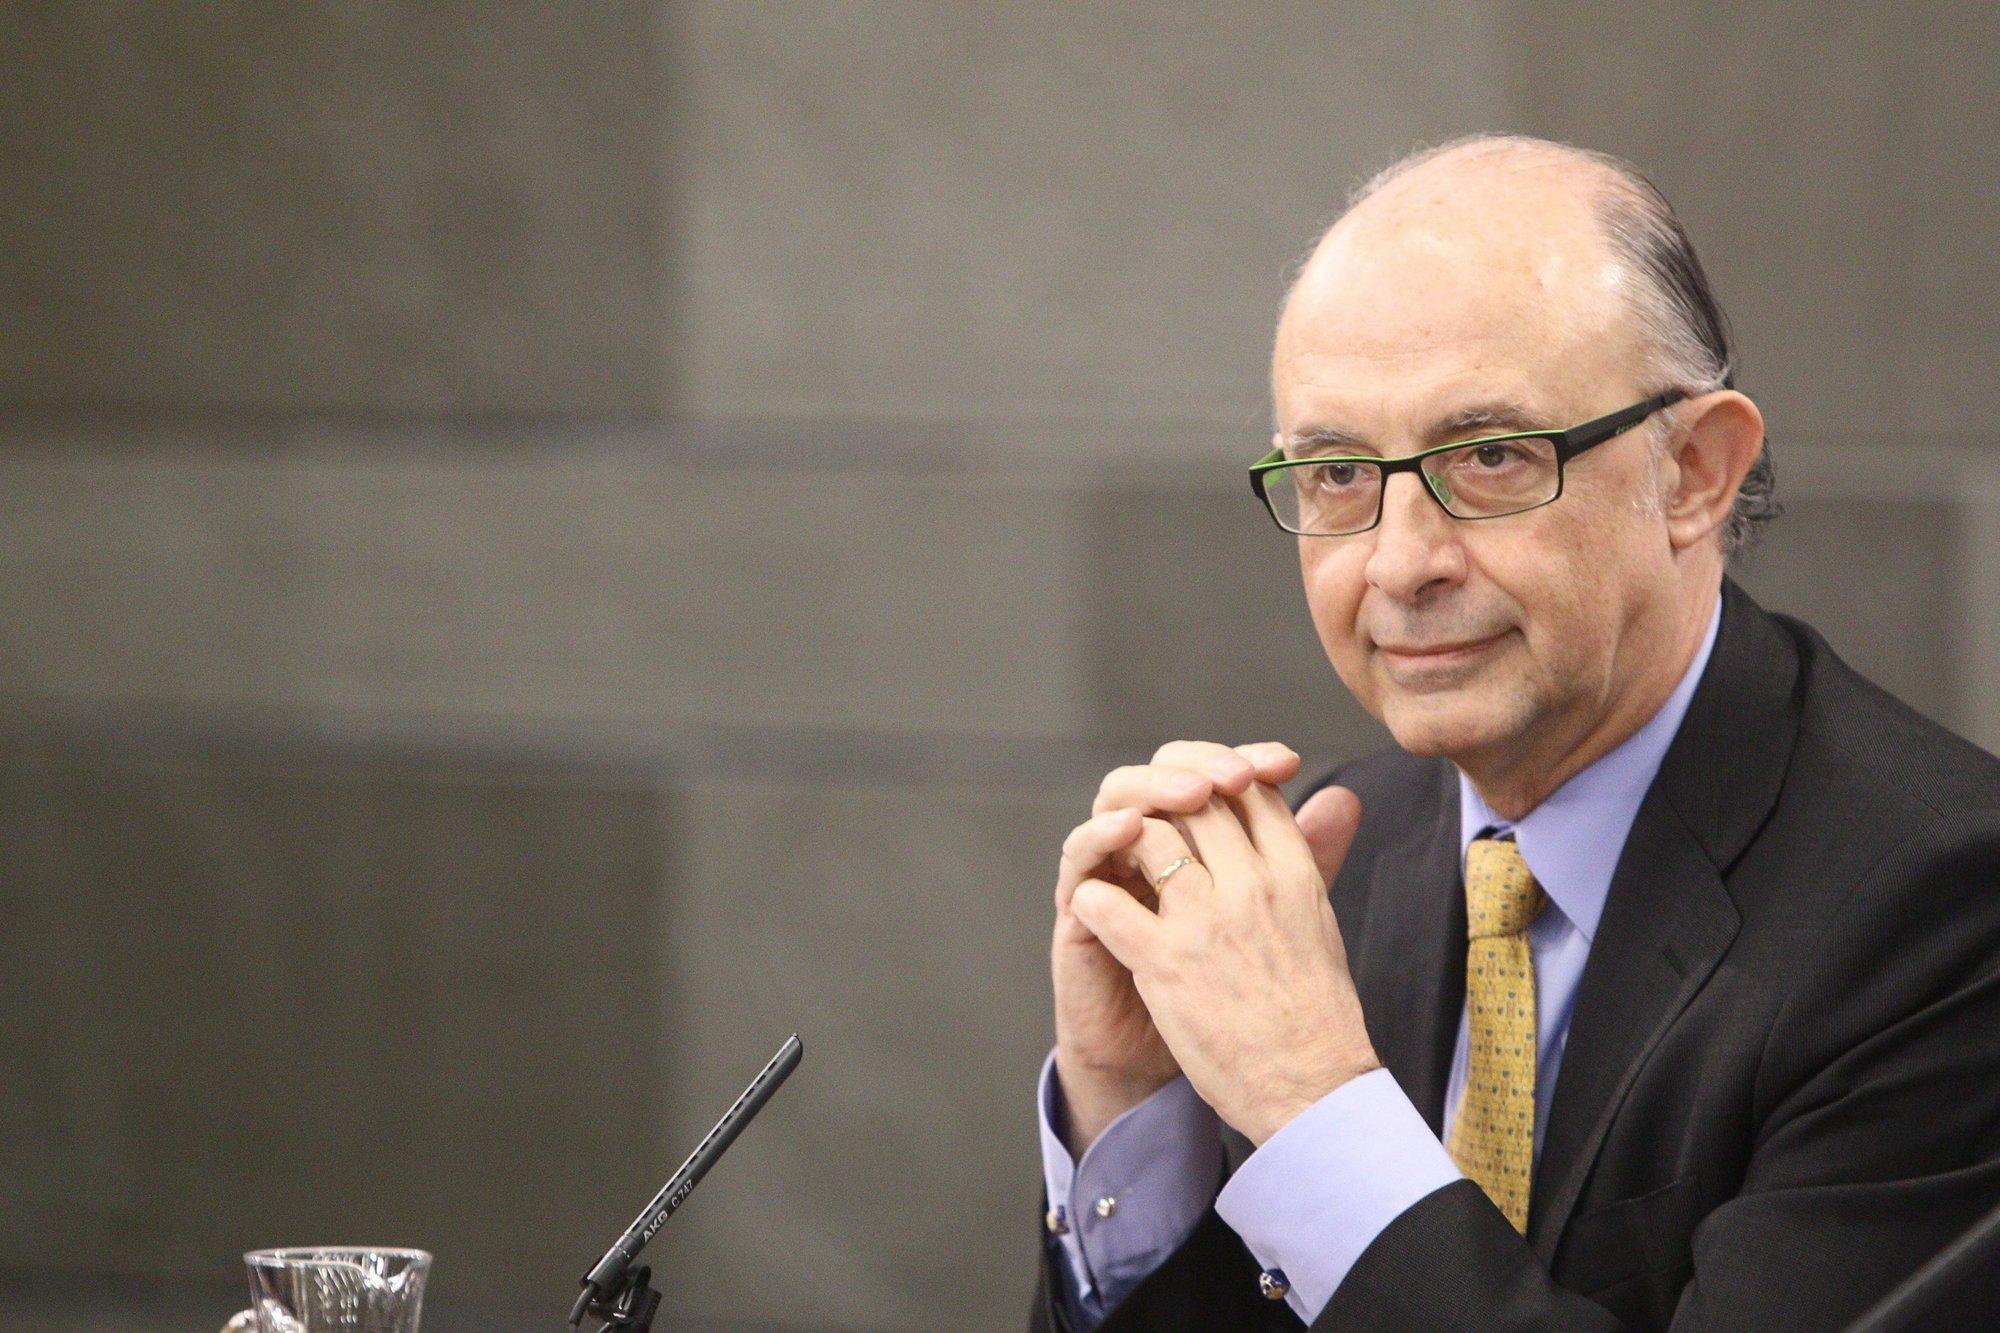 (Ampl.) La Ley de Estabilidad obliga a las administraciones públicas a tener déficit cero a partir de 2020